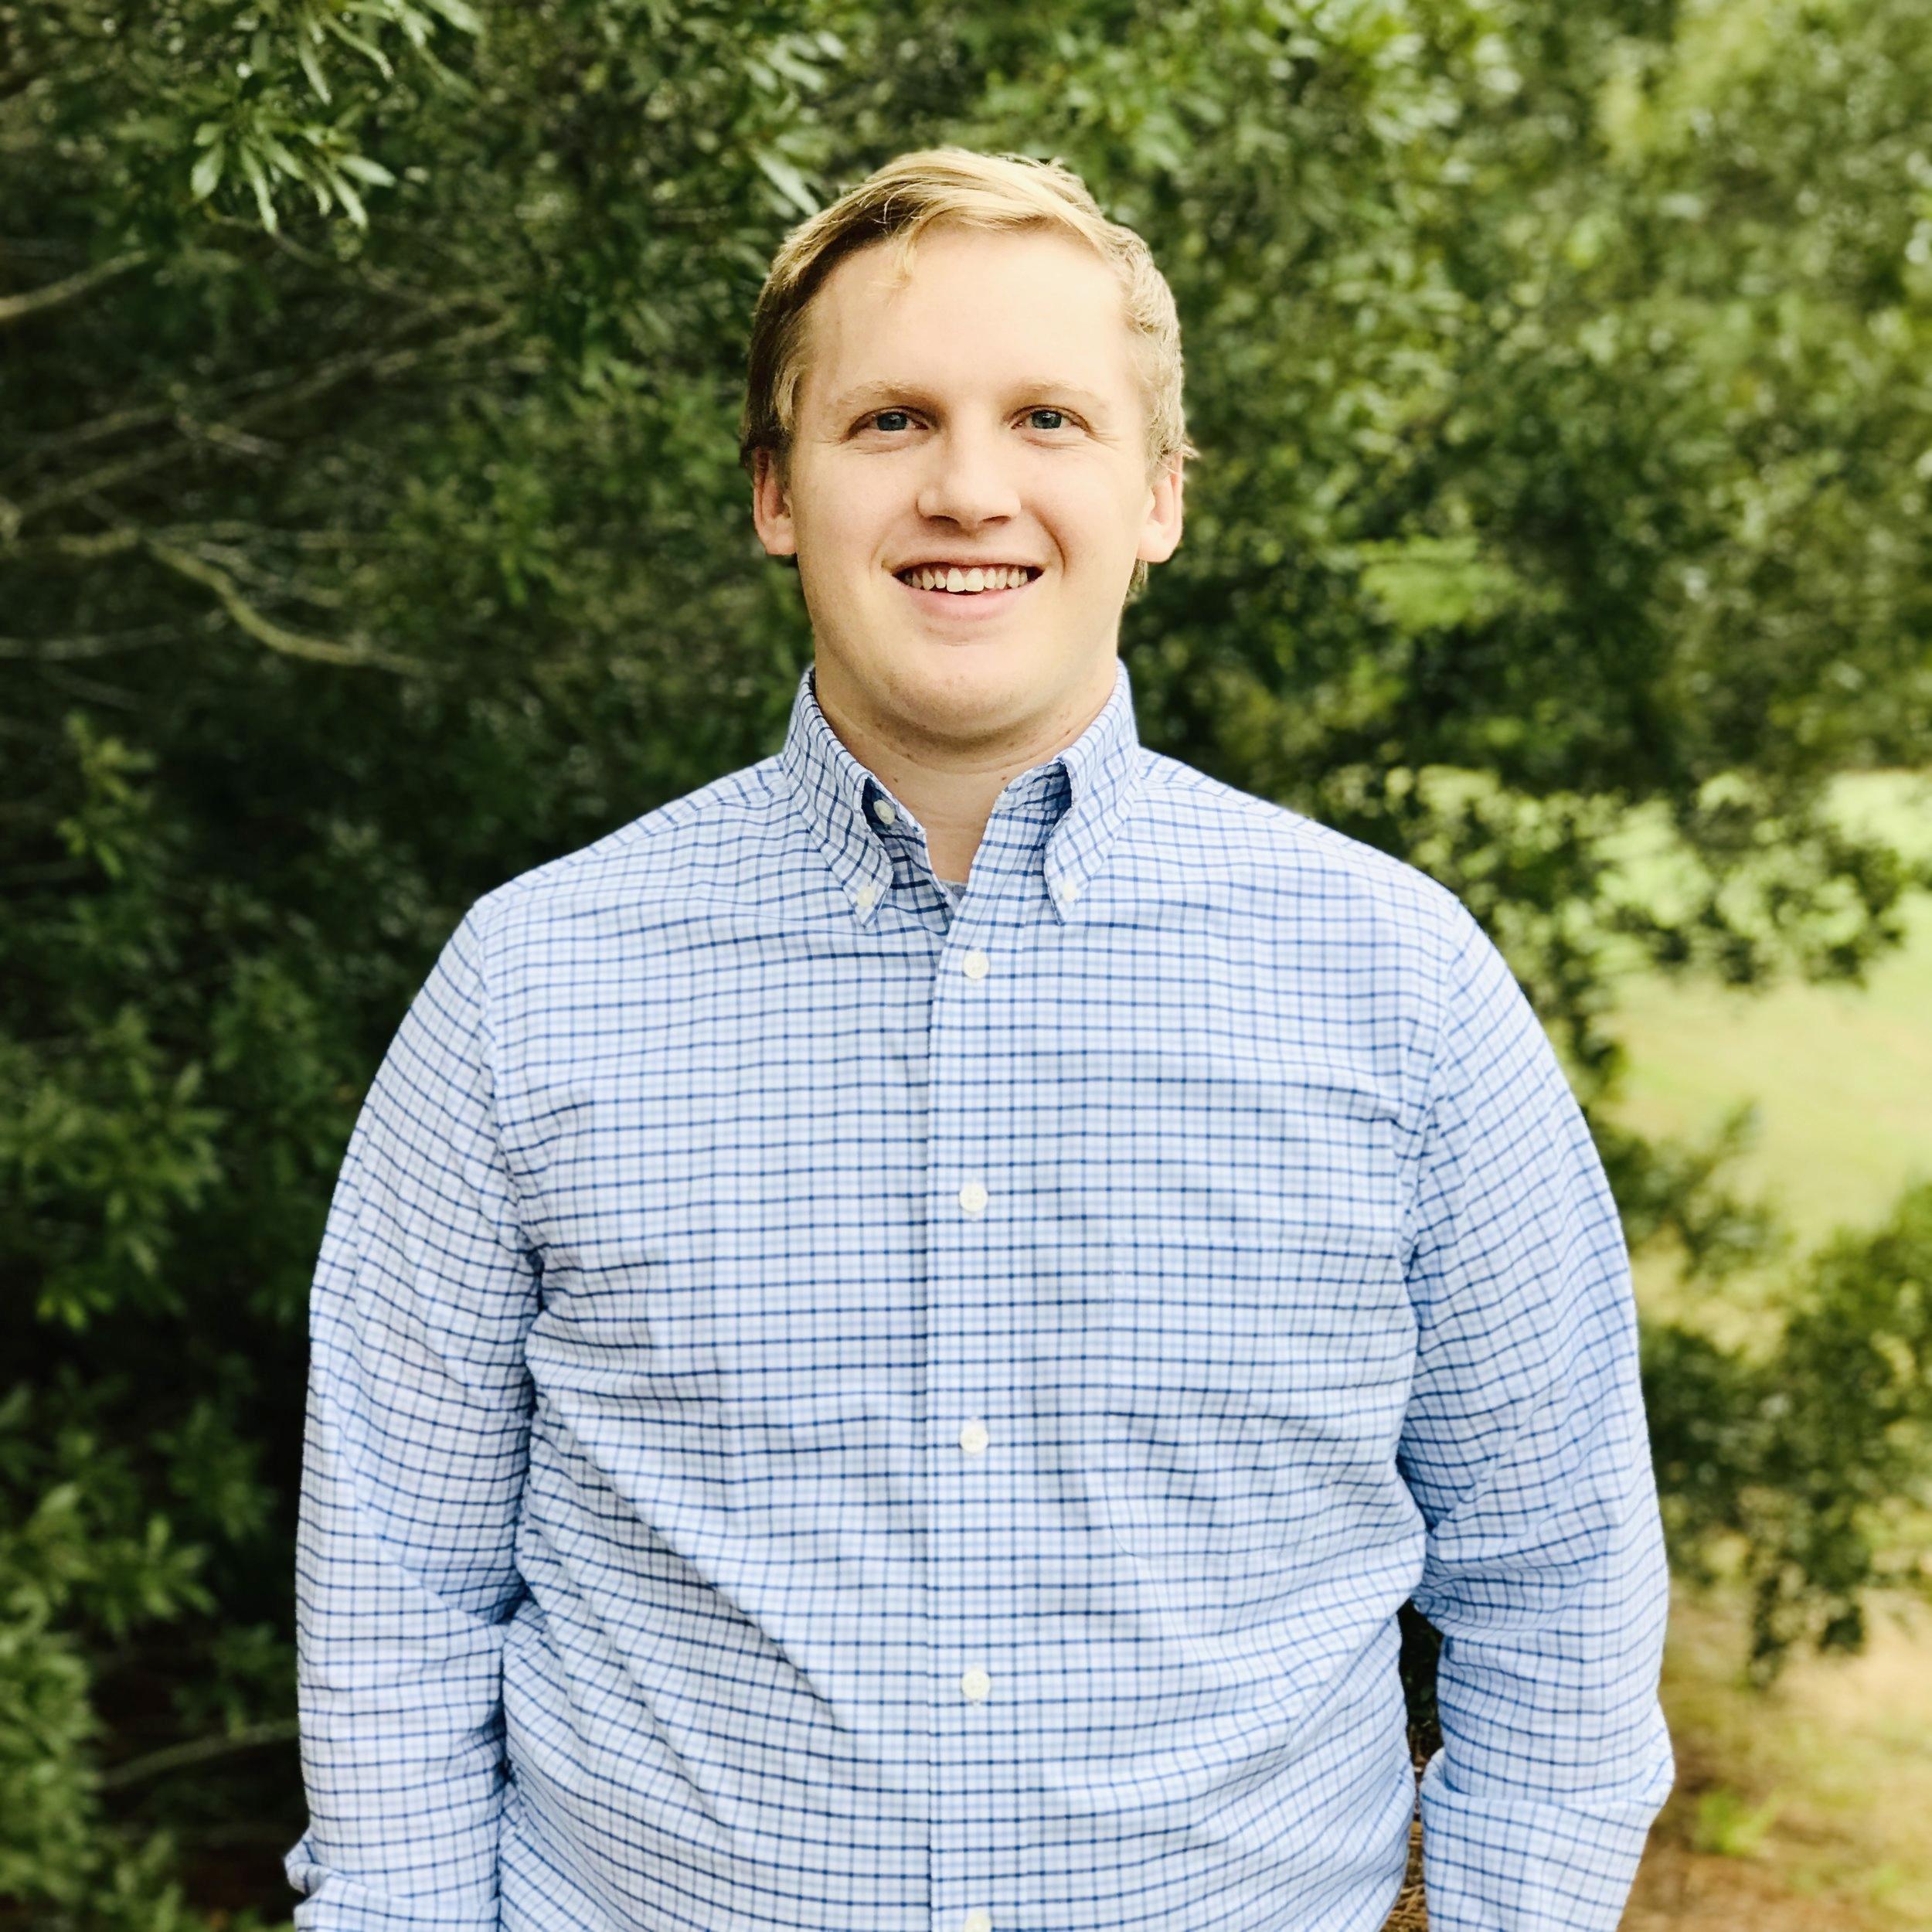 Youth Pastor  Austin Wullschlegger  Contact Austin - austin.w@tmbconline.org